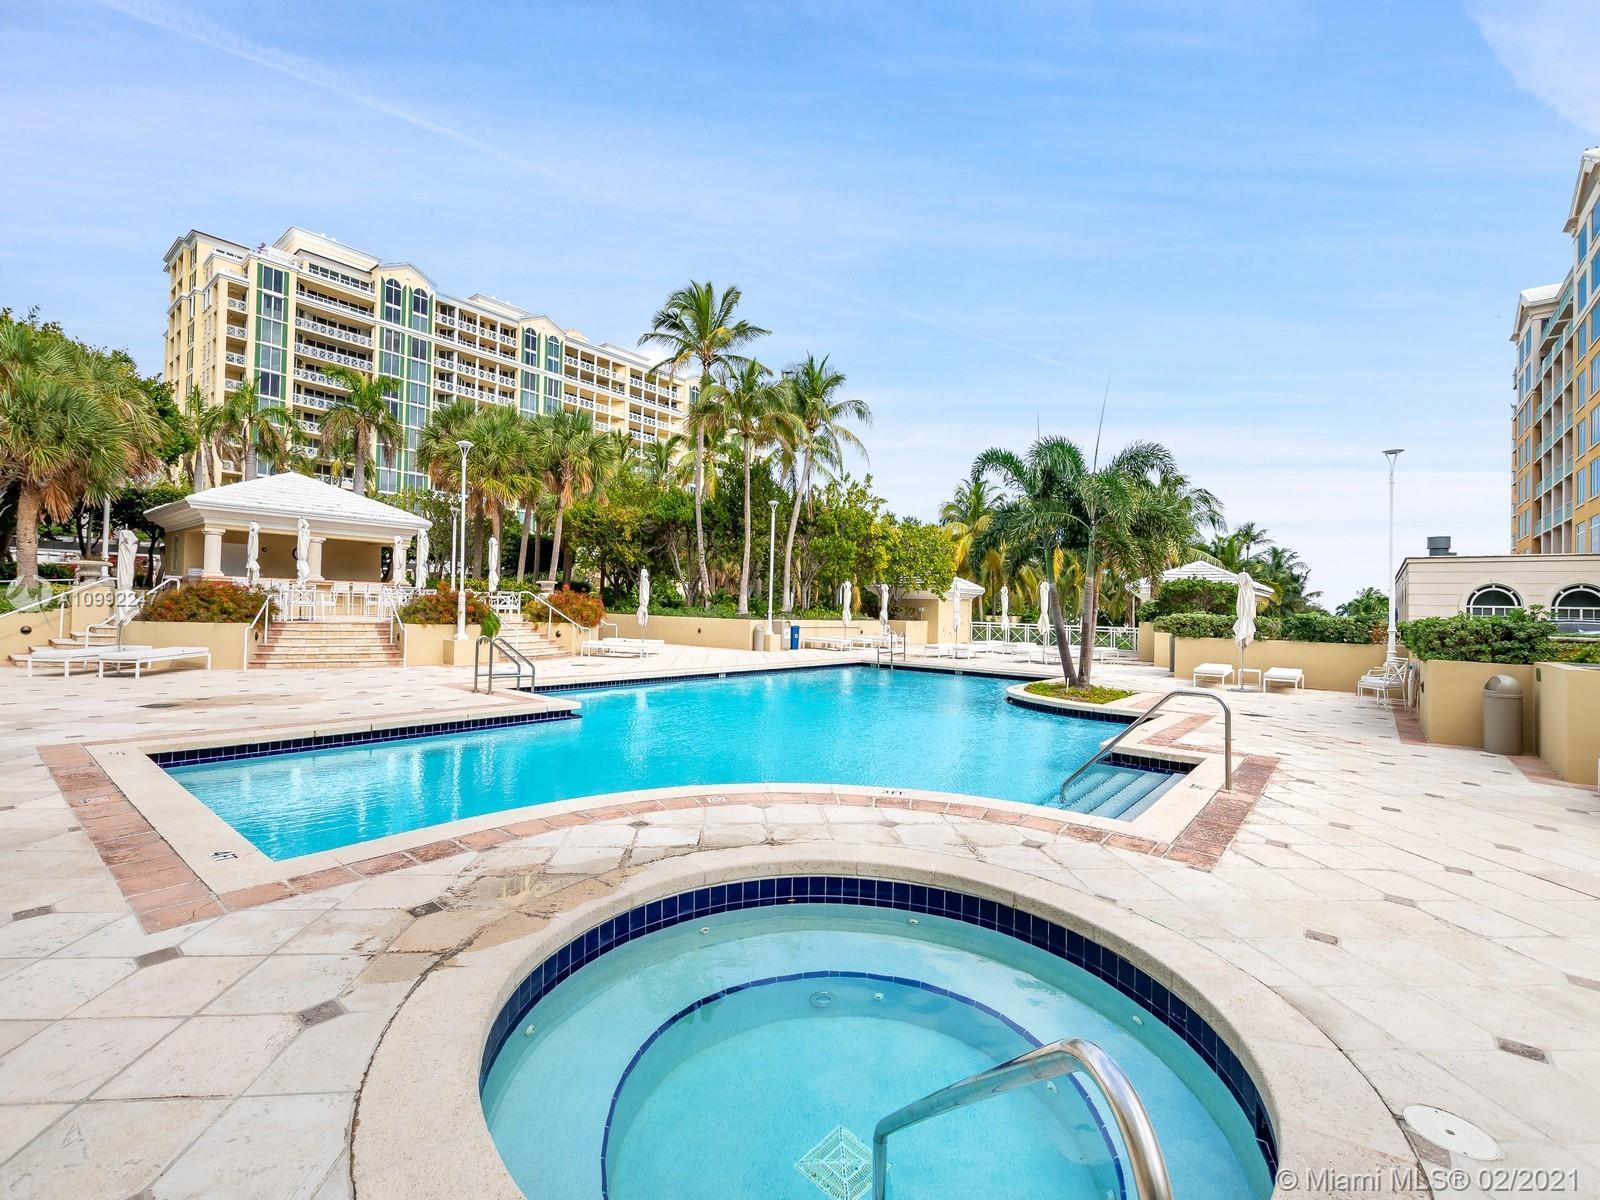 Grand Bay Residences - Condos for sale